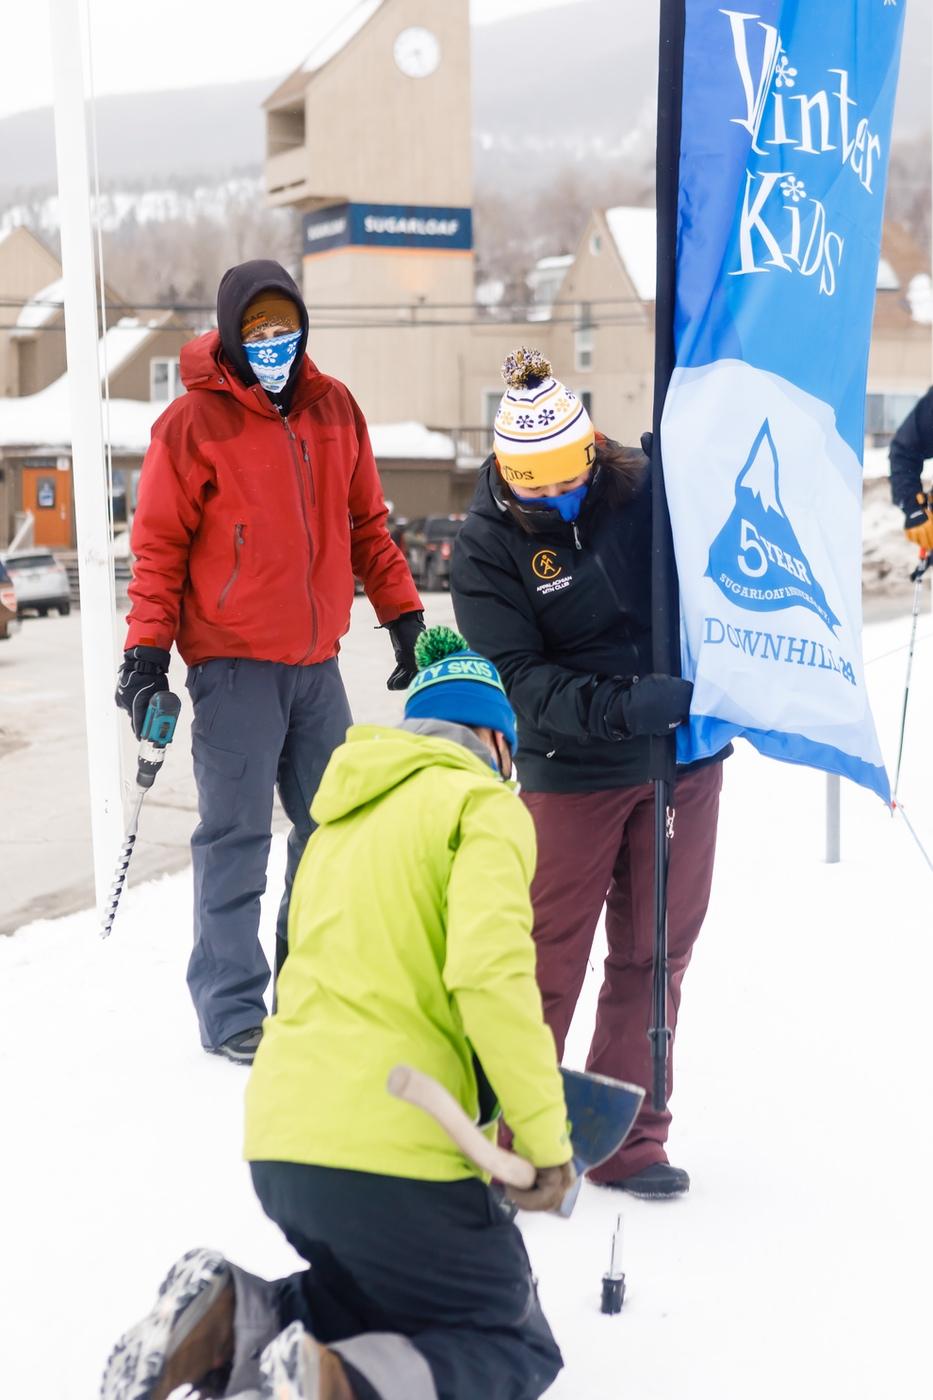 WinterKids Downhill 24 2021 SDP 2743